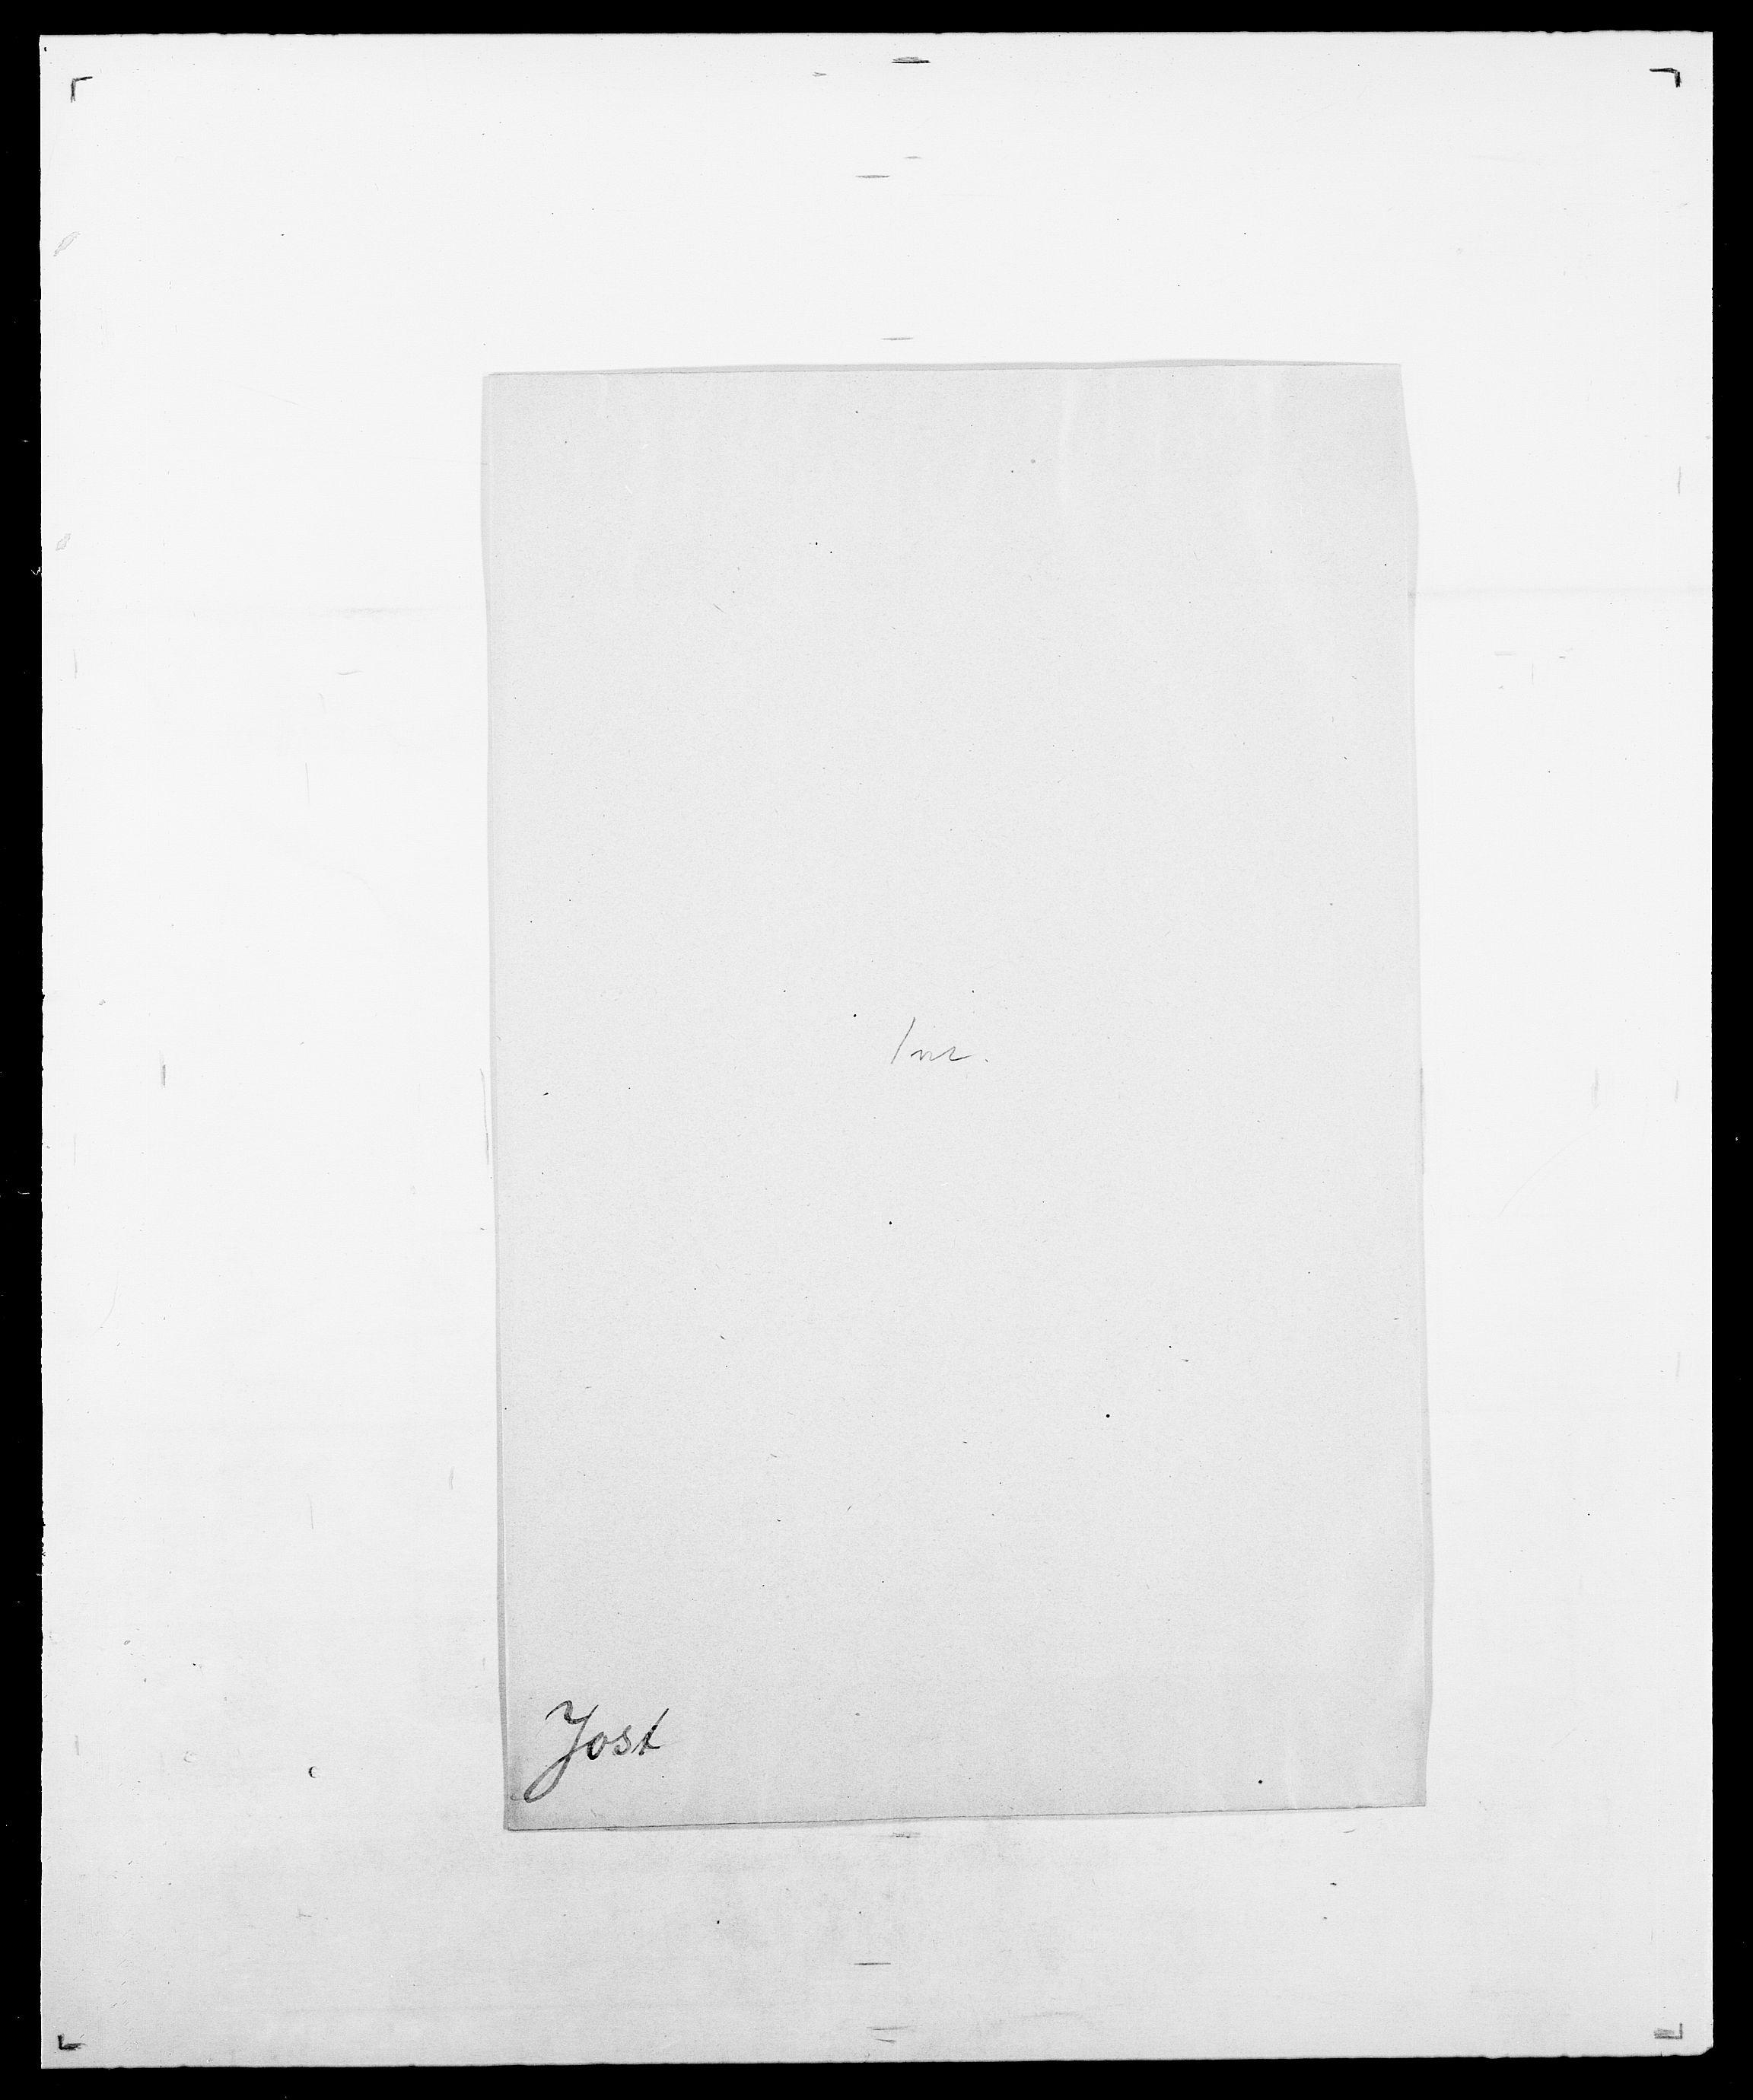 SAO, Delgobe, Charles Antoine - samling, D/Da/L0019: van der Hude - Joys, s. 917